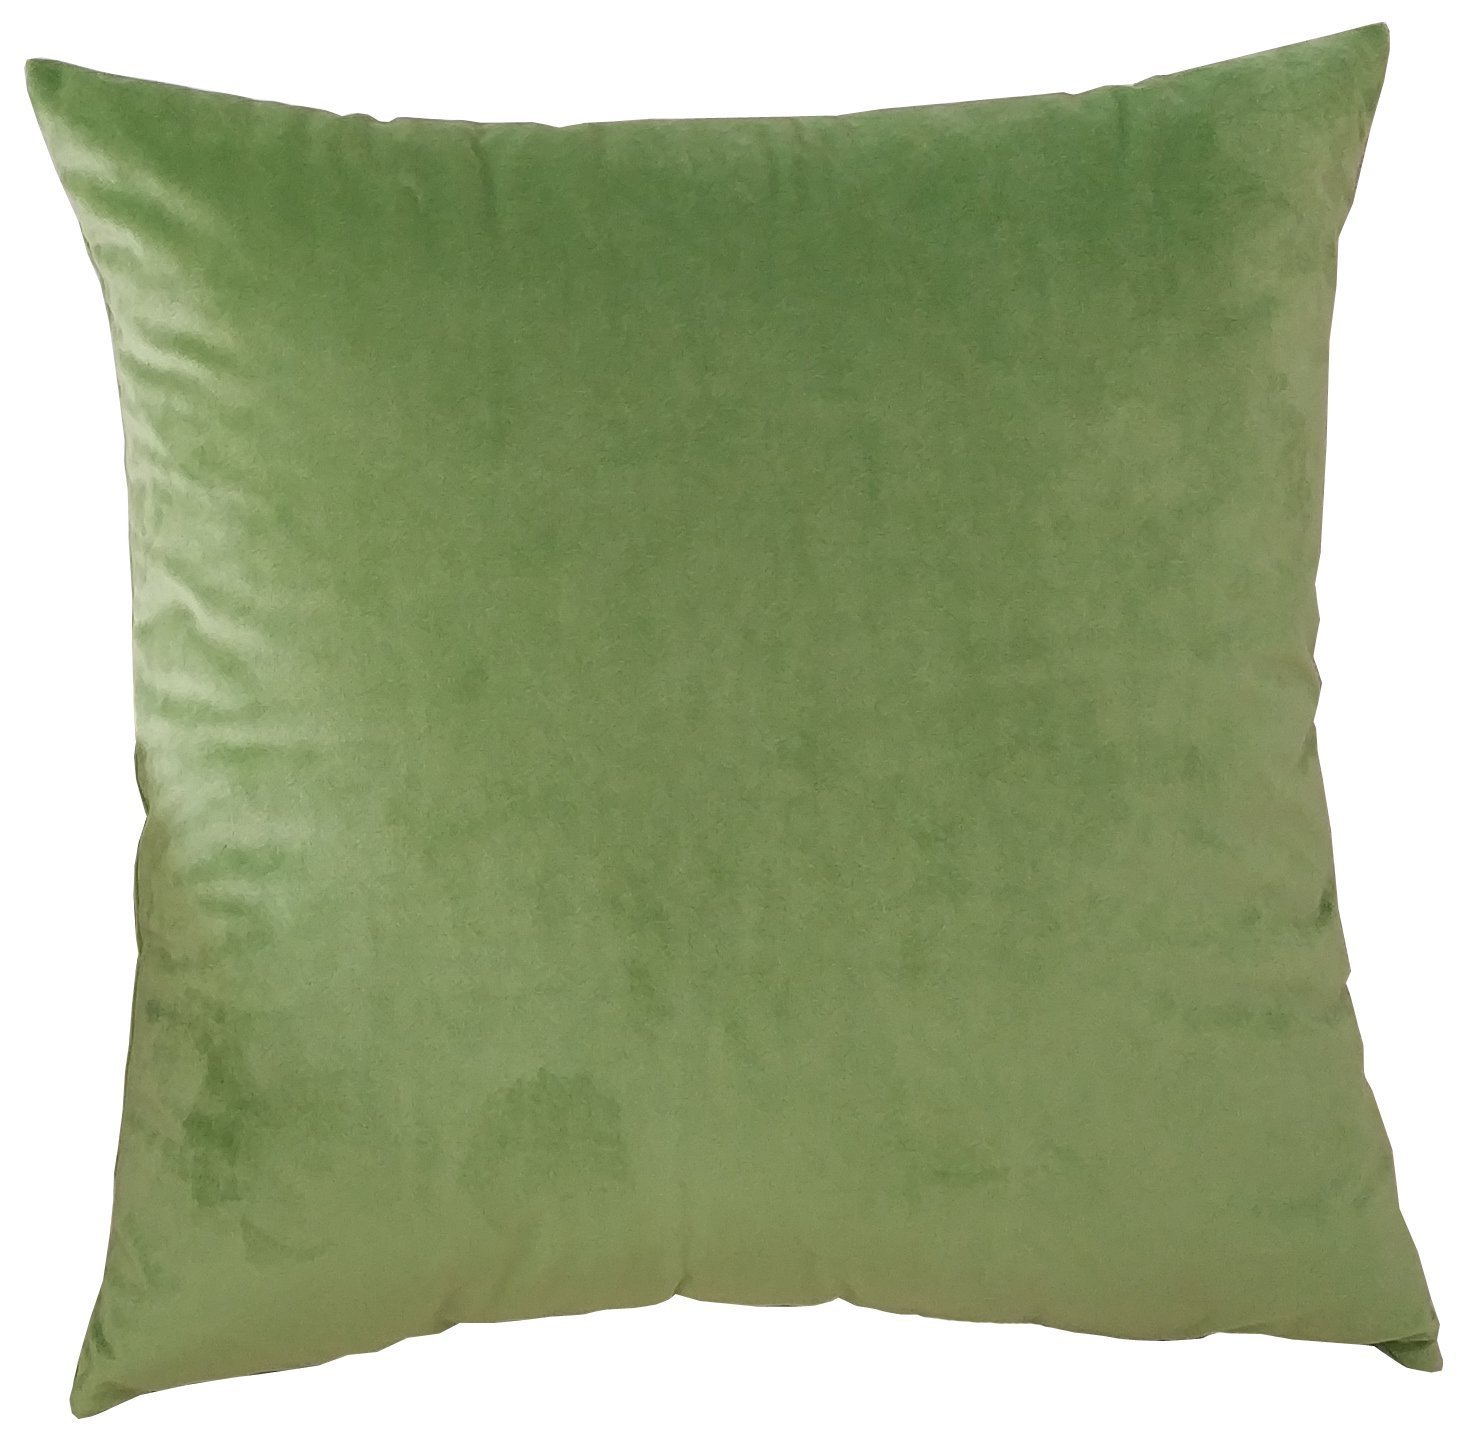 M MOCHOHOME Decorative Microfiber Solid Square Throw Pillow Cover Case Pillowcase Cushion Sham - 16'' x 16'', Green